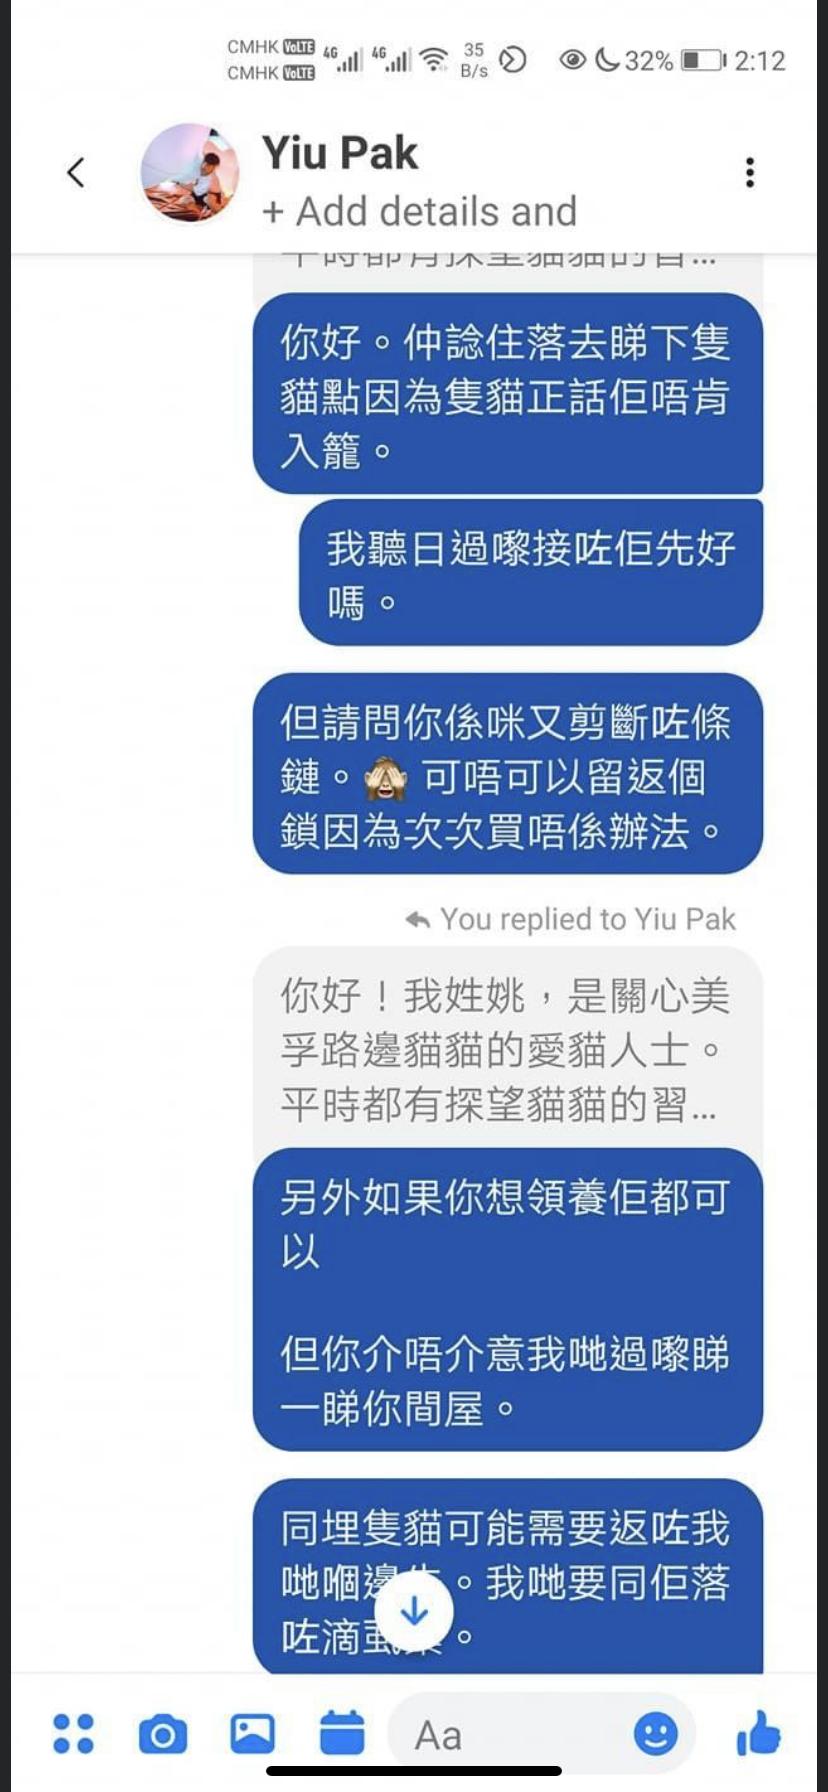 https://upload.hkgolden.media/comment/wcgam1qm.1sdgpyyv4eh.cg2hscdyohu.kop.png